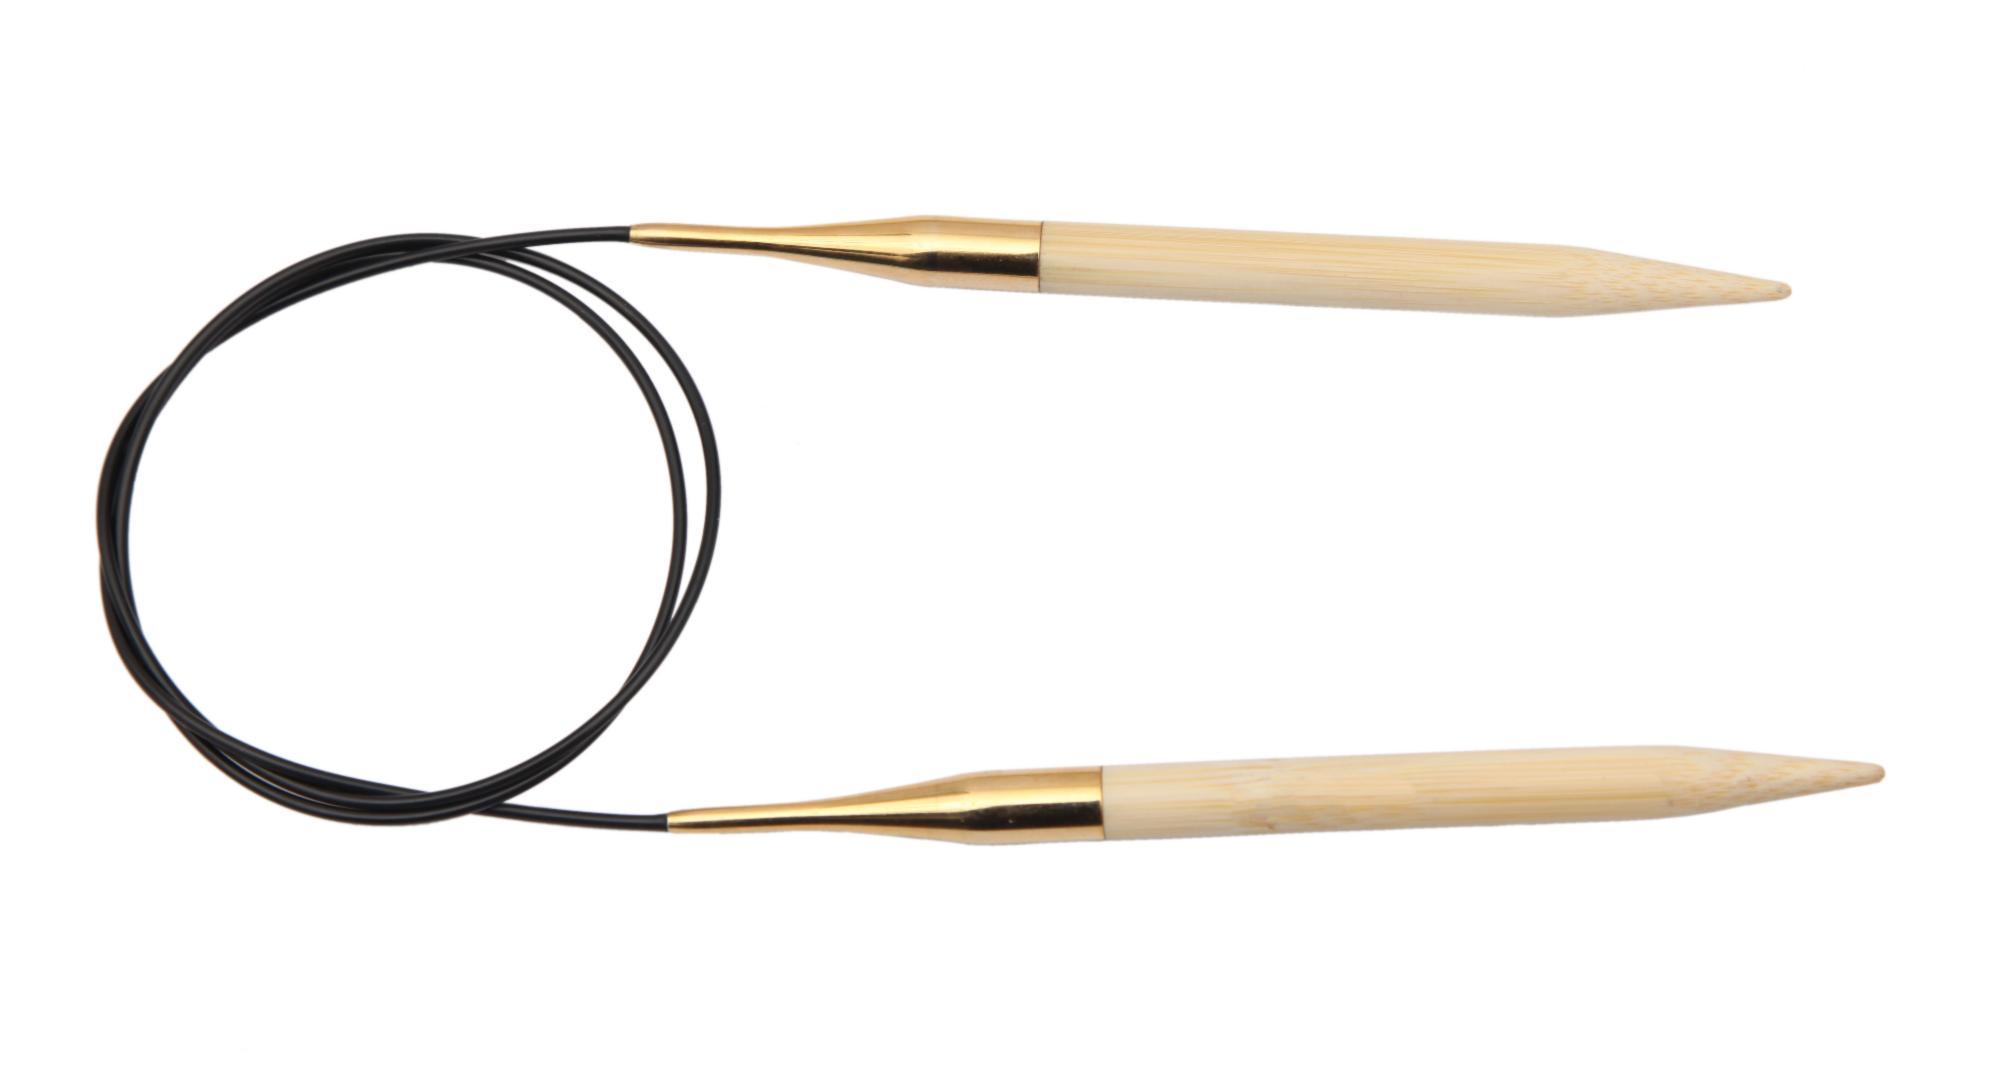 Спицы круговые 80 см Bamboo KnitPro, 22241, 2.00 мм